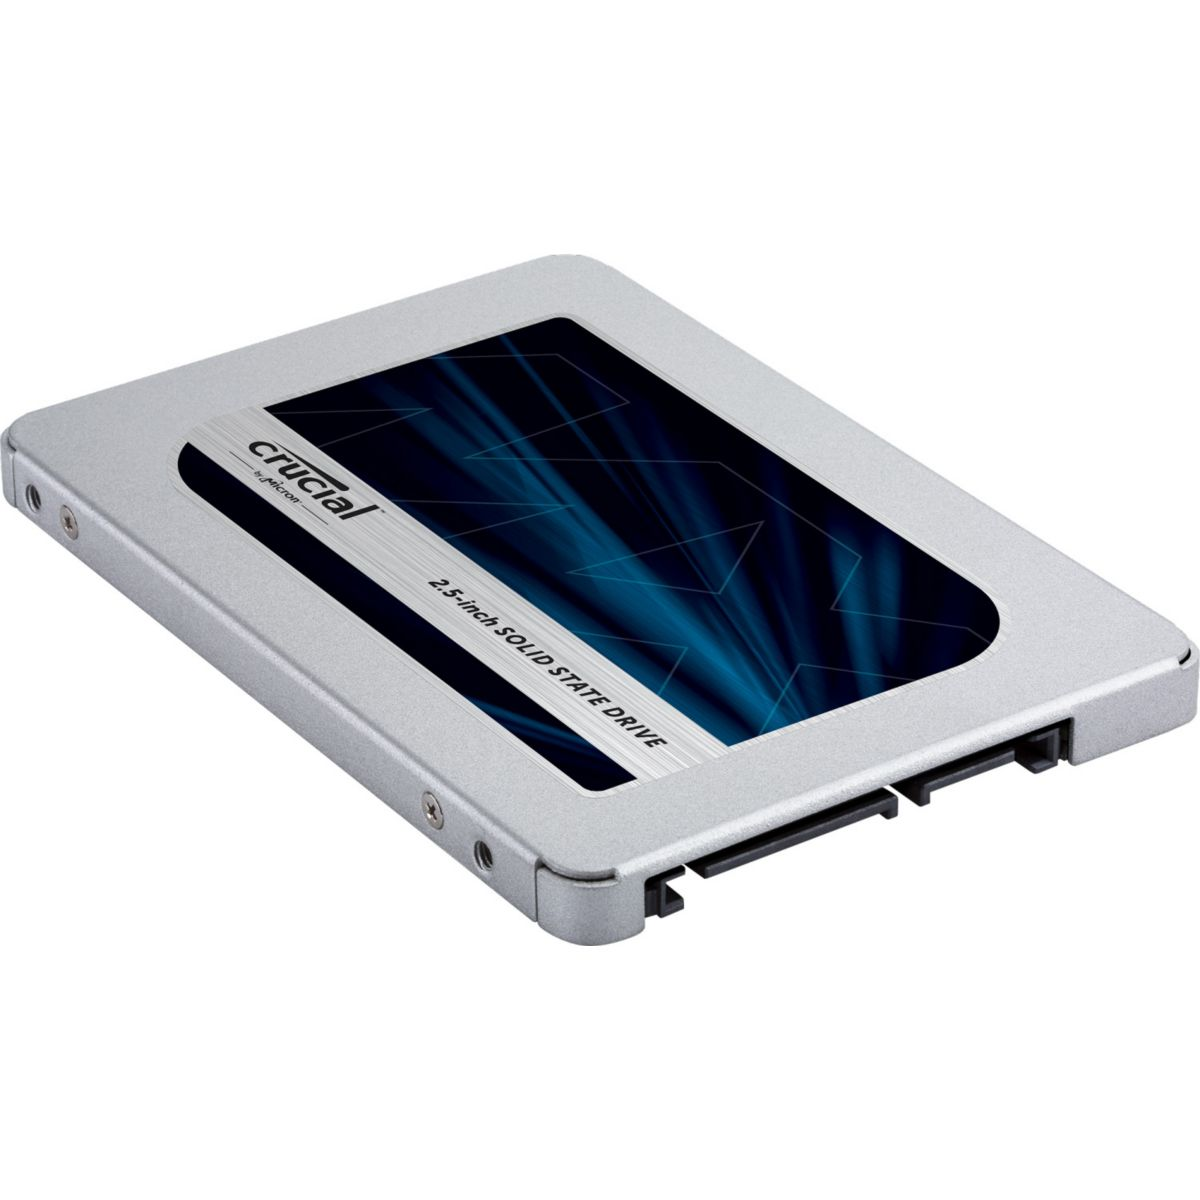 Disque CRUCIAL 2To MX500 SATA 2.5'' 7mm (photo)